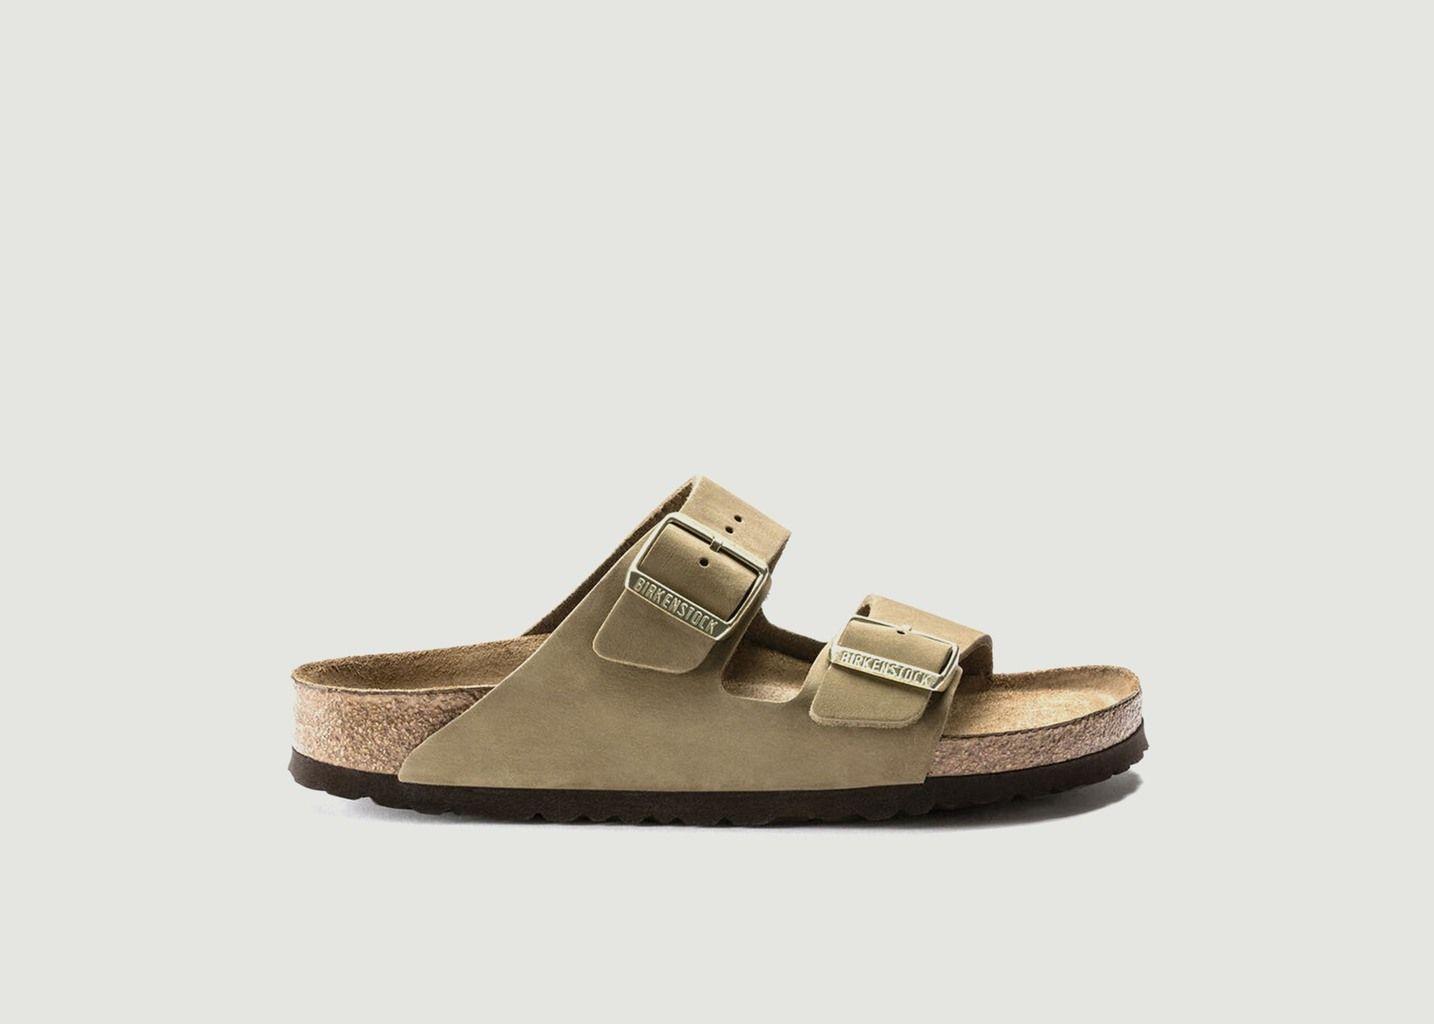 Sandales Arizona - Birkenstock